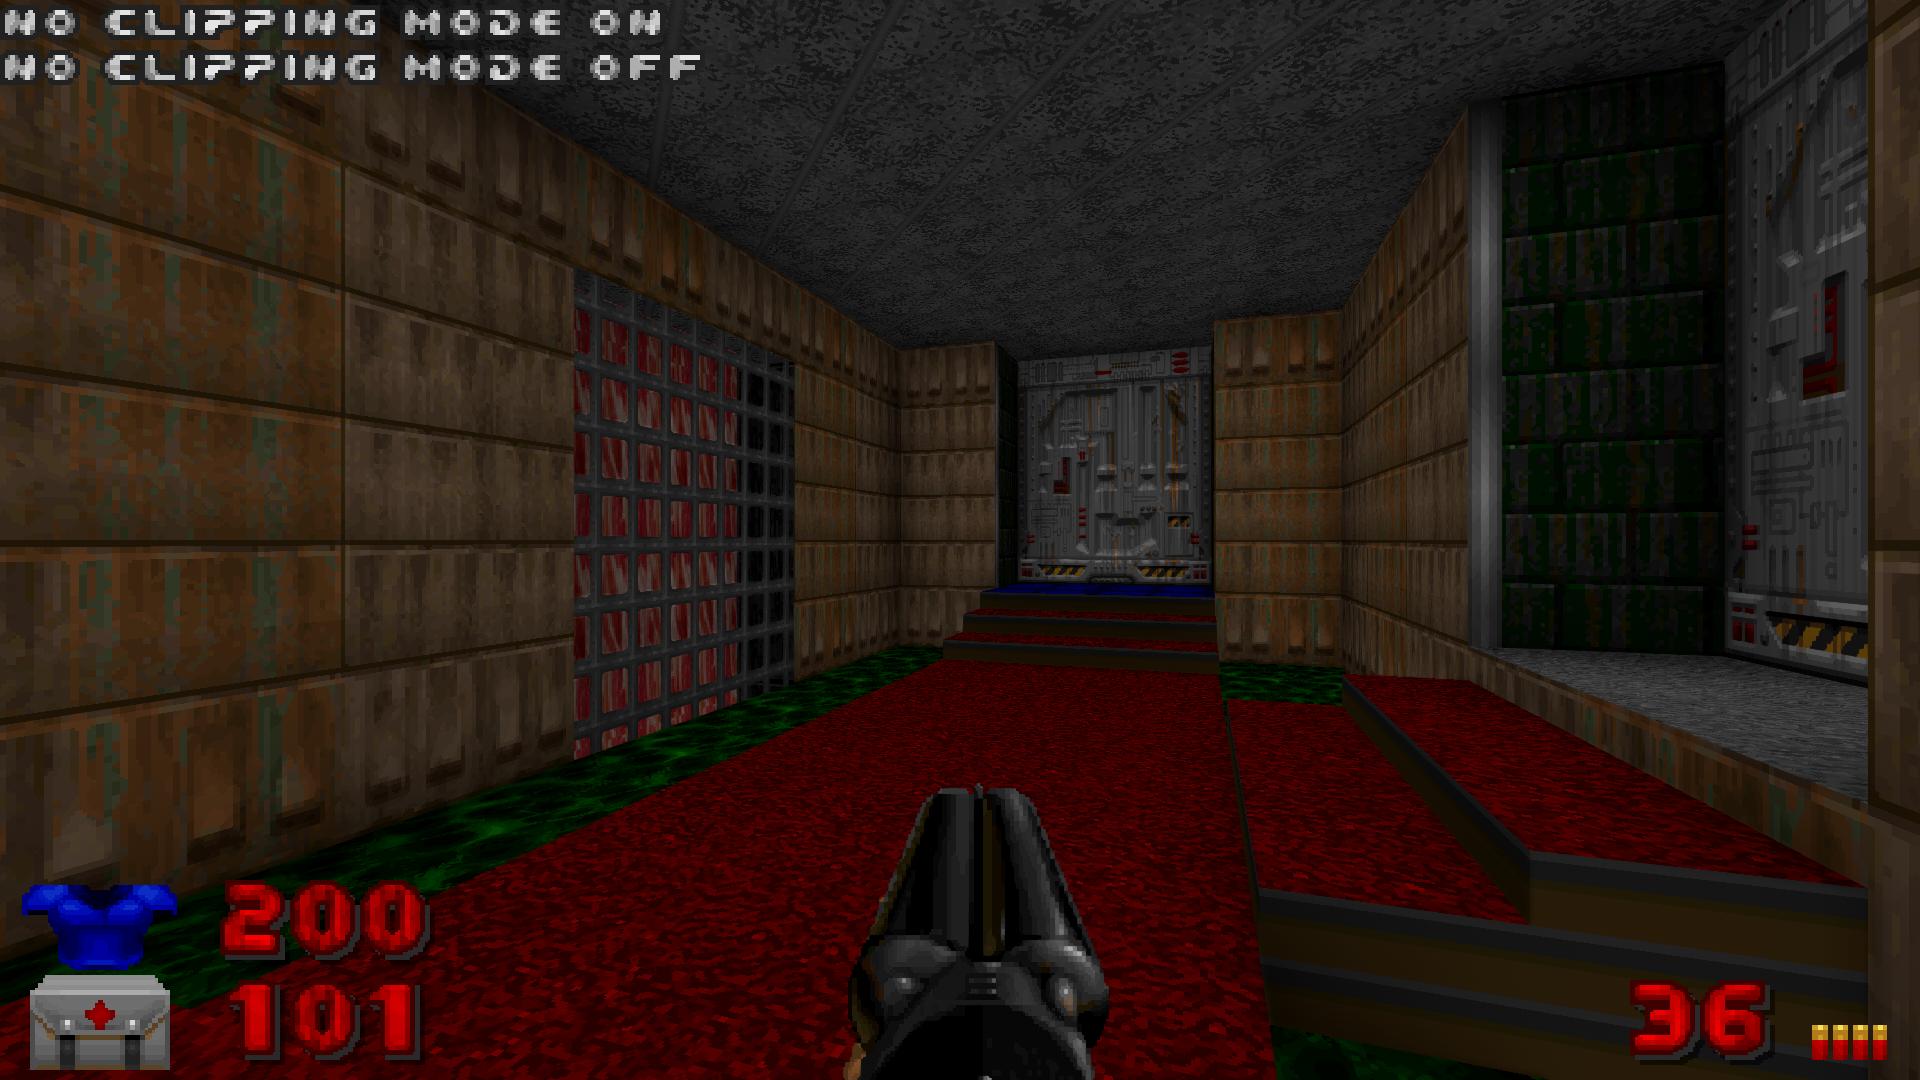 Screenshot_Doom_20210225_184701.png.50484d7da6ed1542ced20addbace8871.png